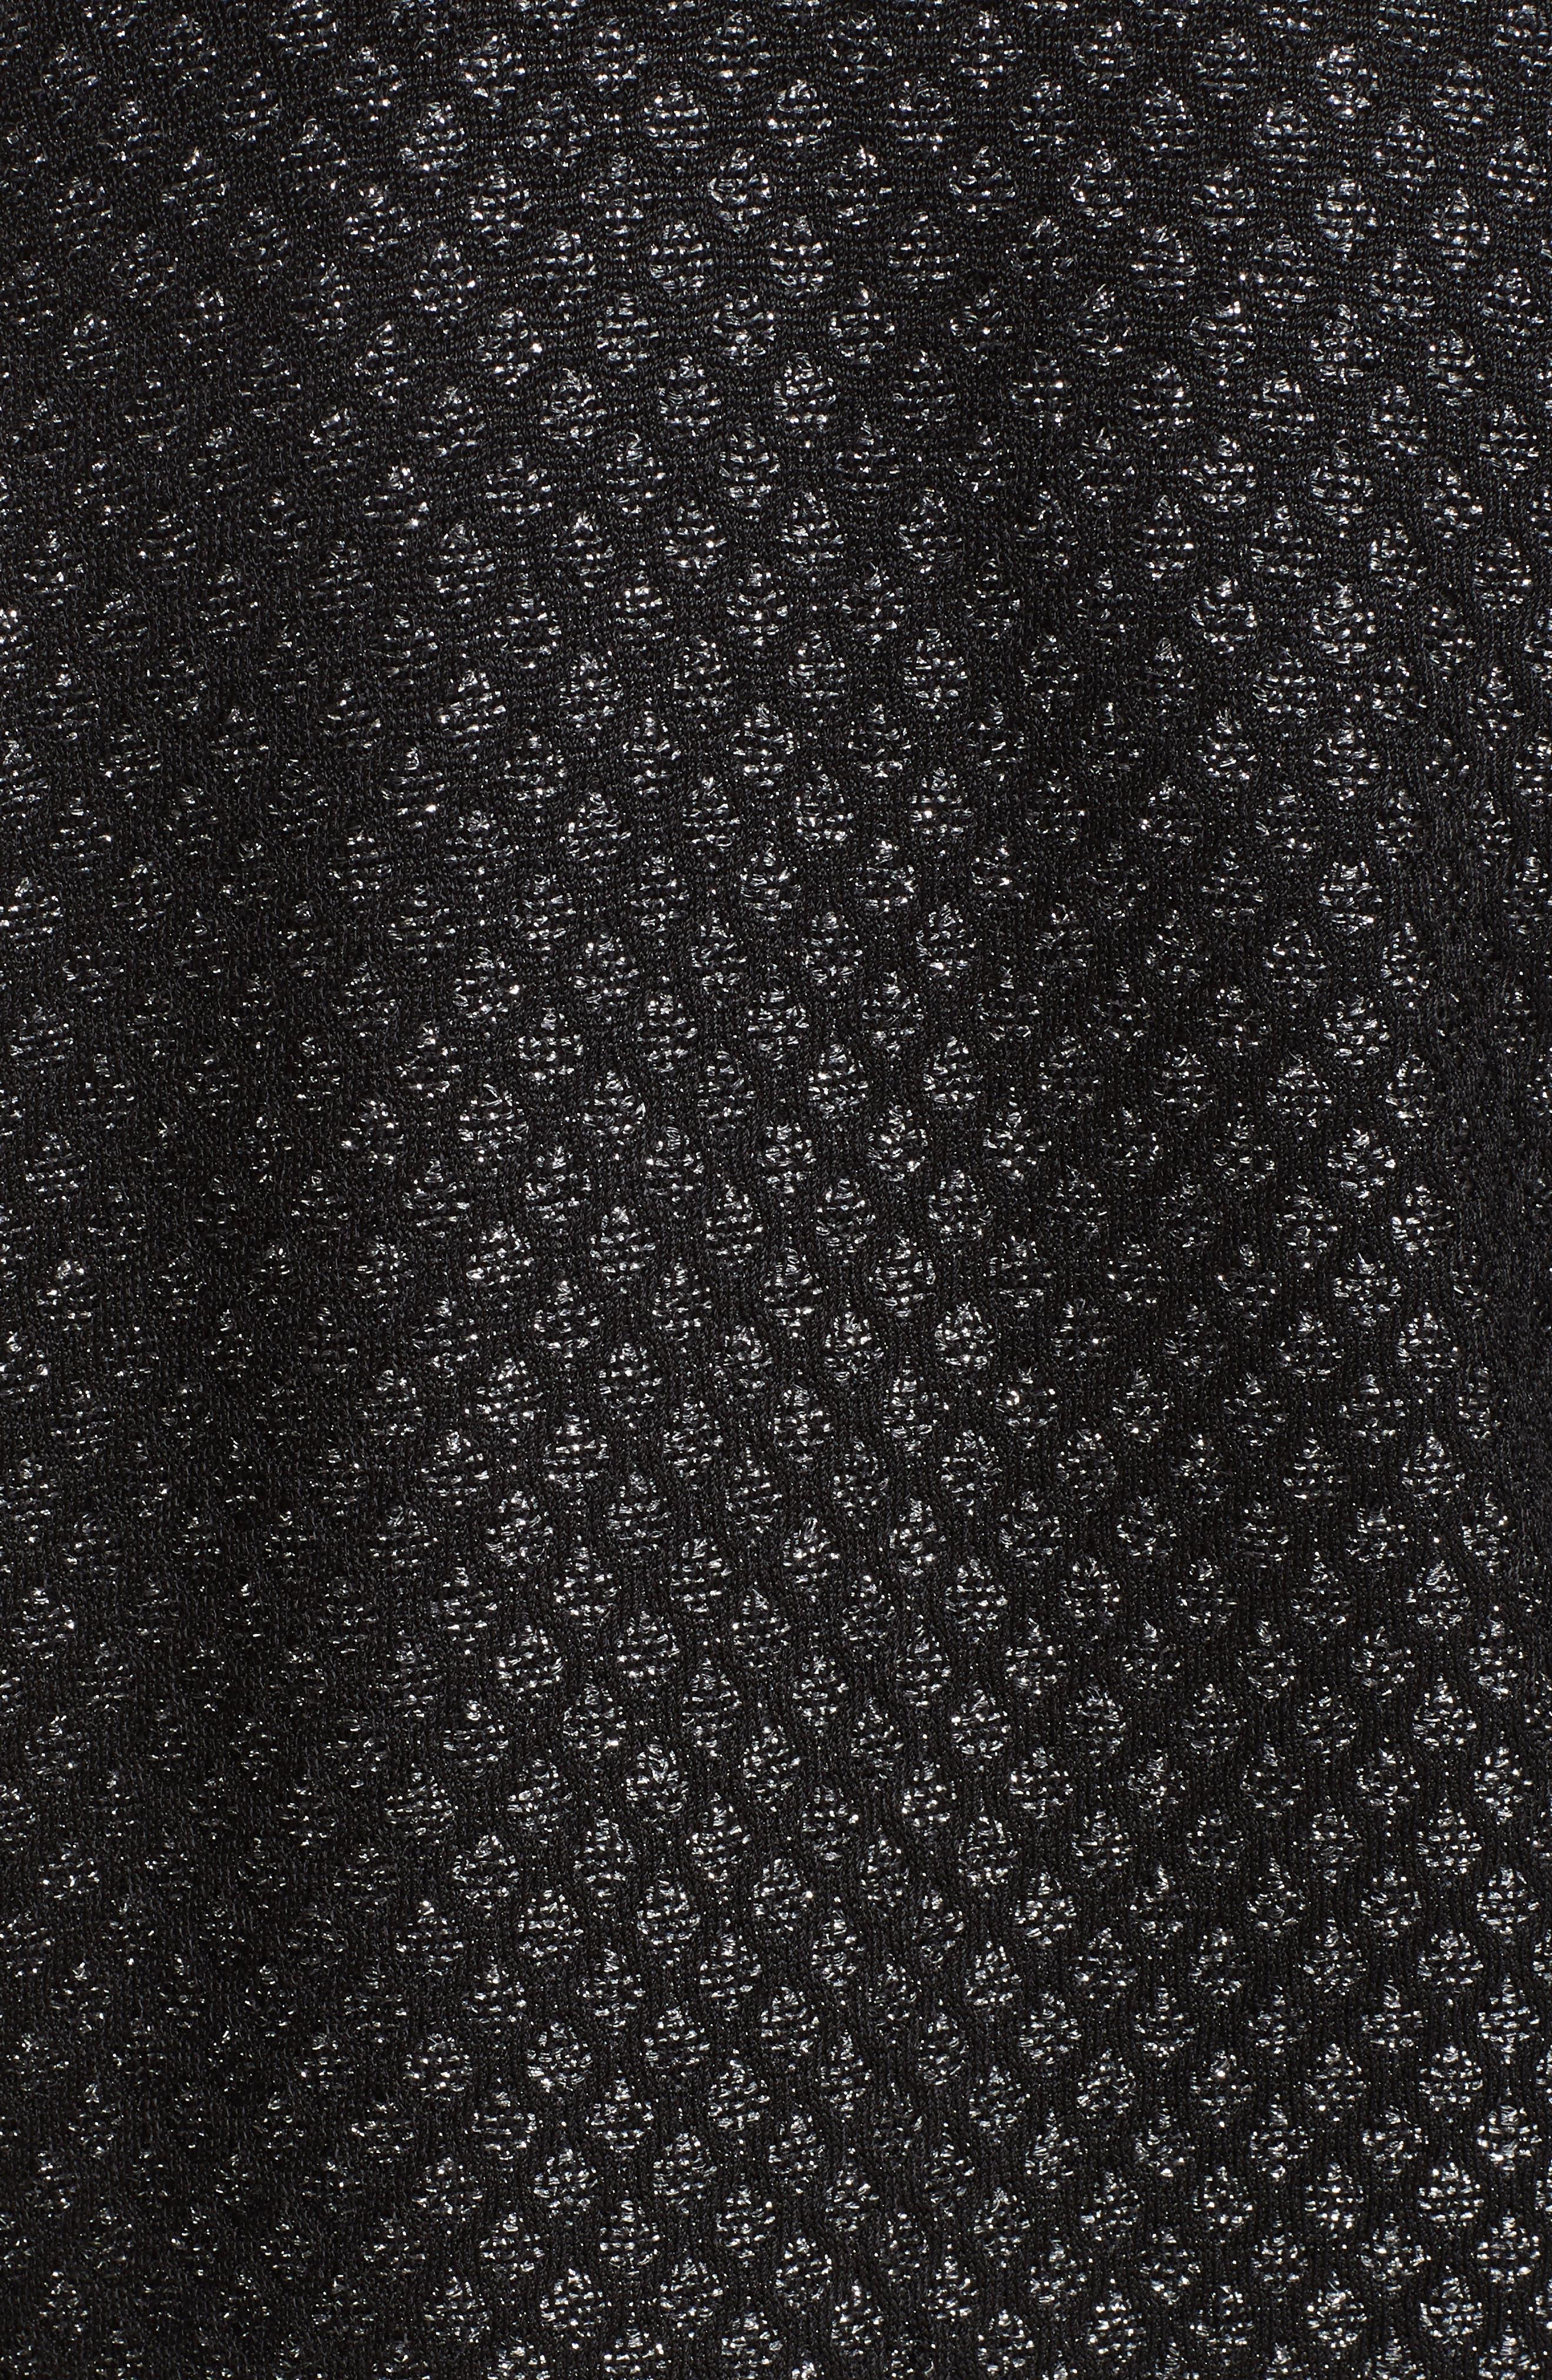 Shimmer Inlay Brocade Knit Jacket,                             Alternate thumbnail 7, color,                             CAVIAR/ SILVER